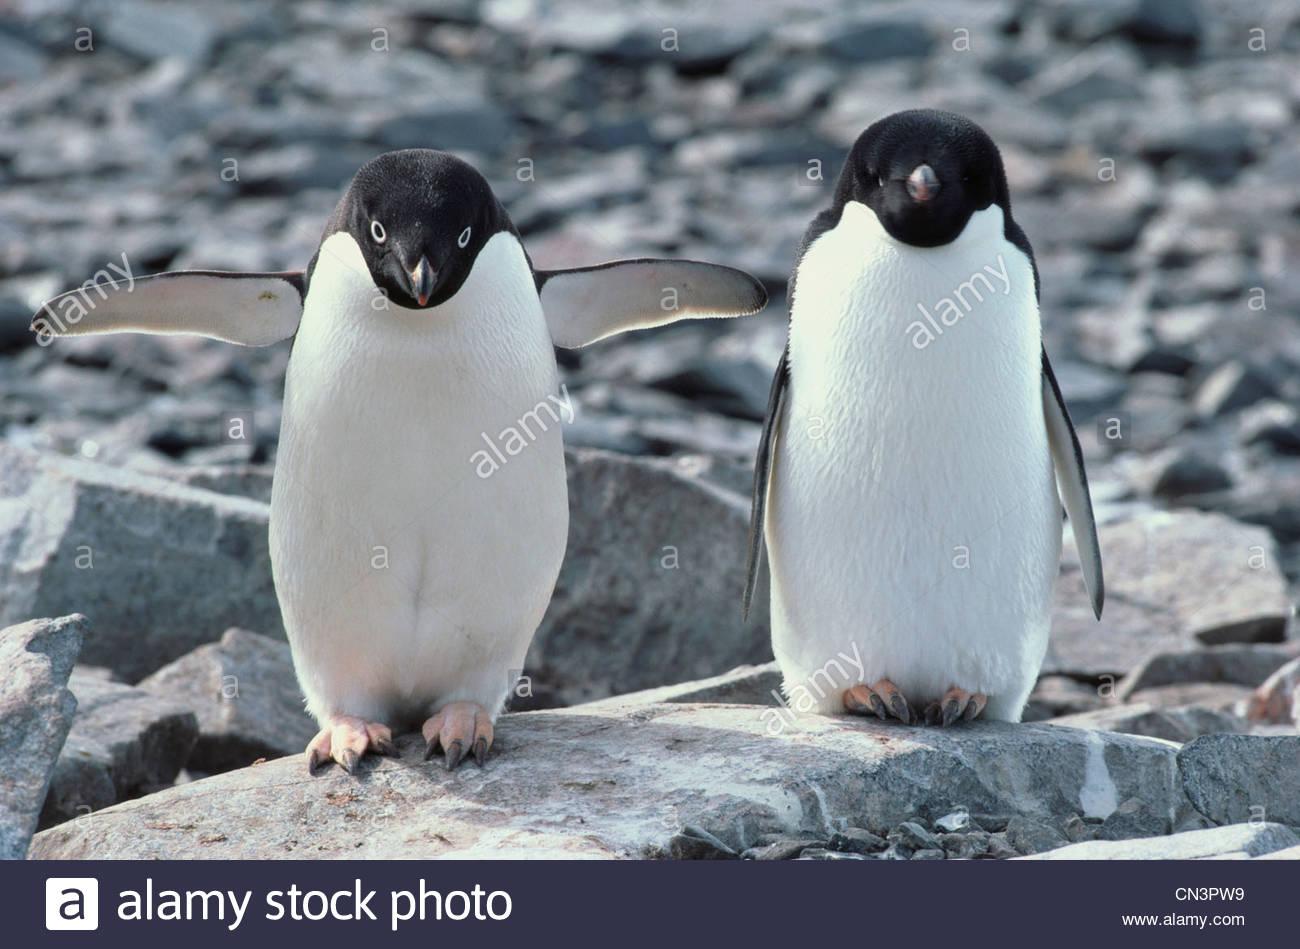 Adelie penguin pair, Antarctica - Stock Image